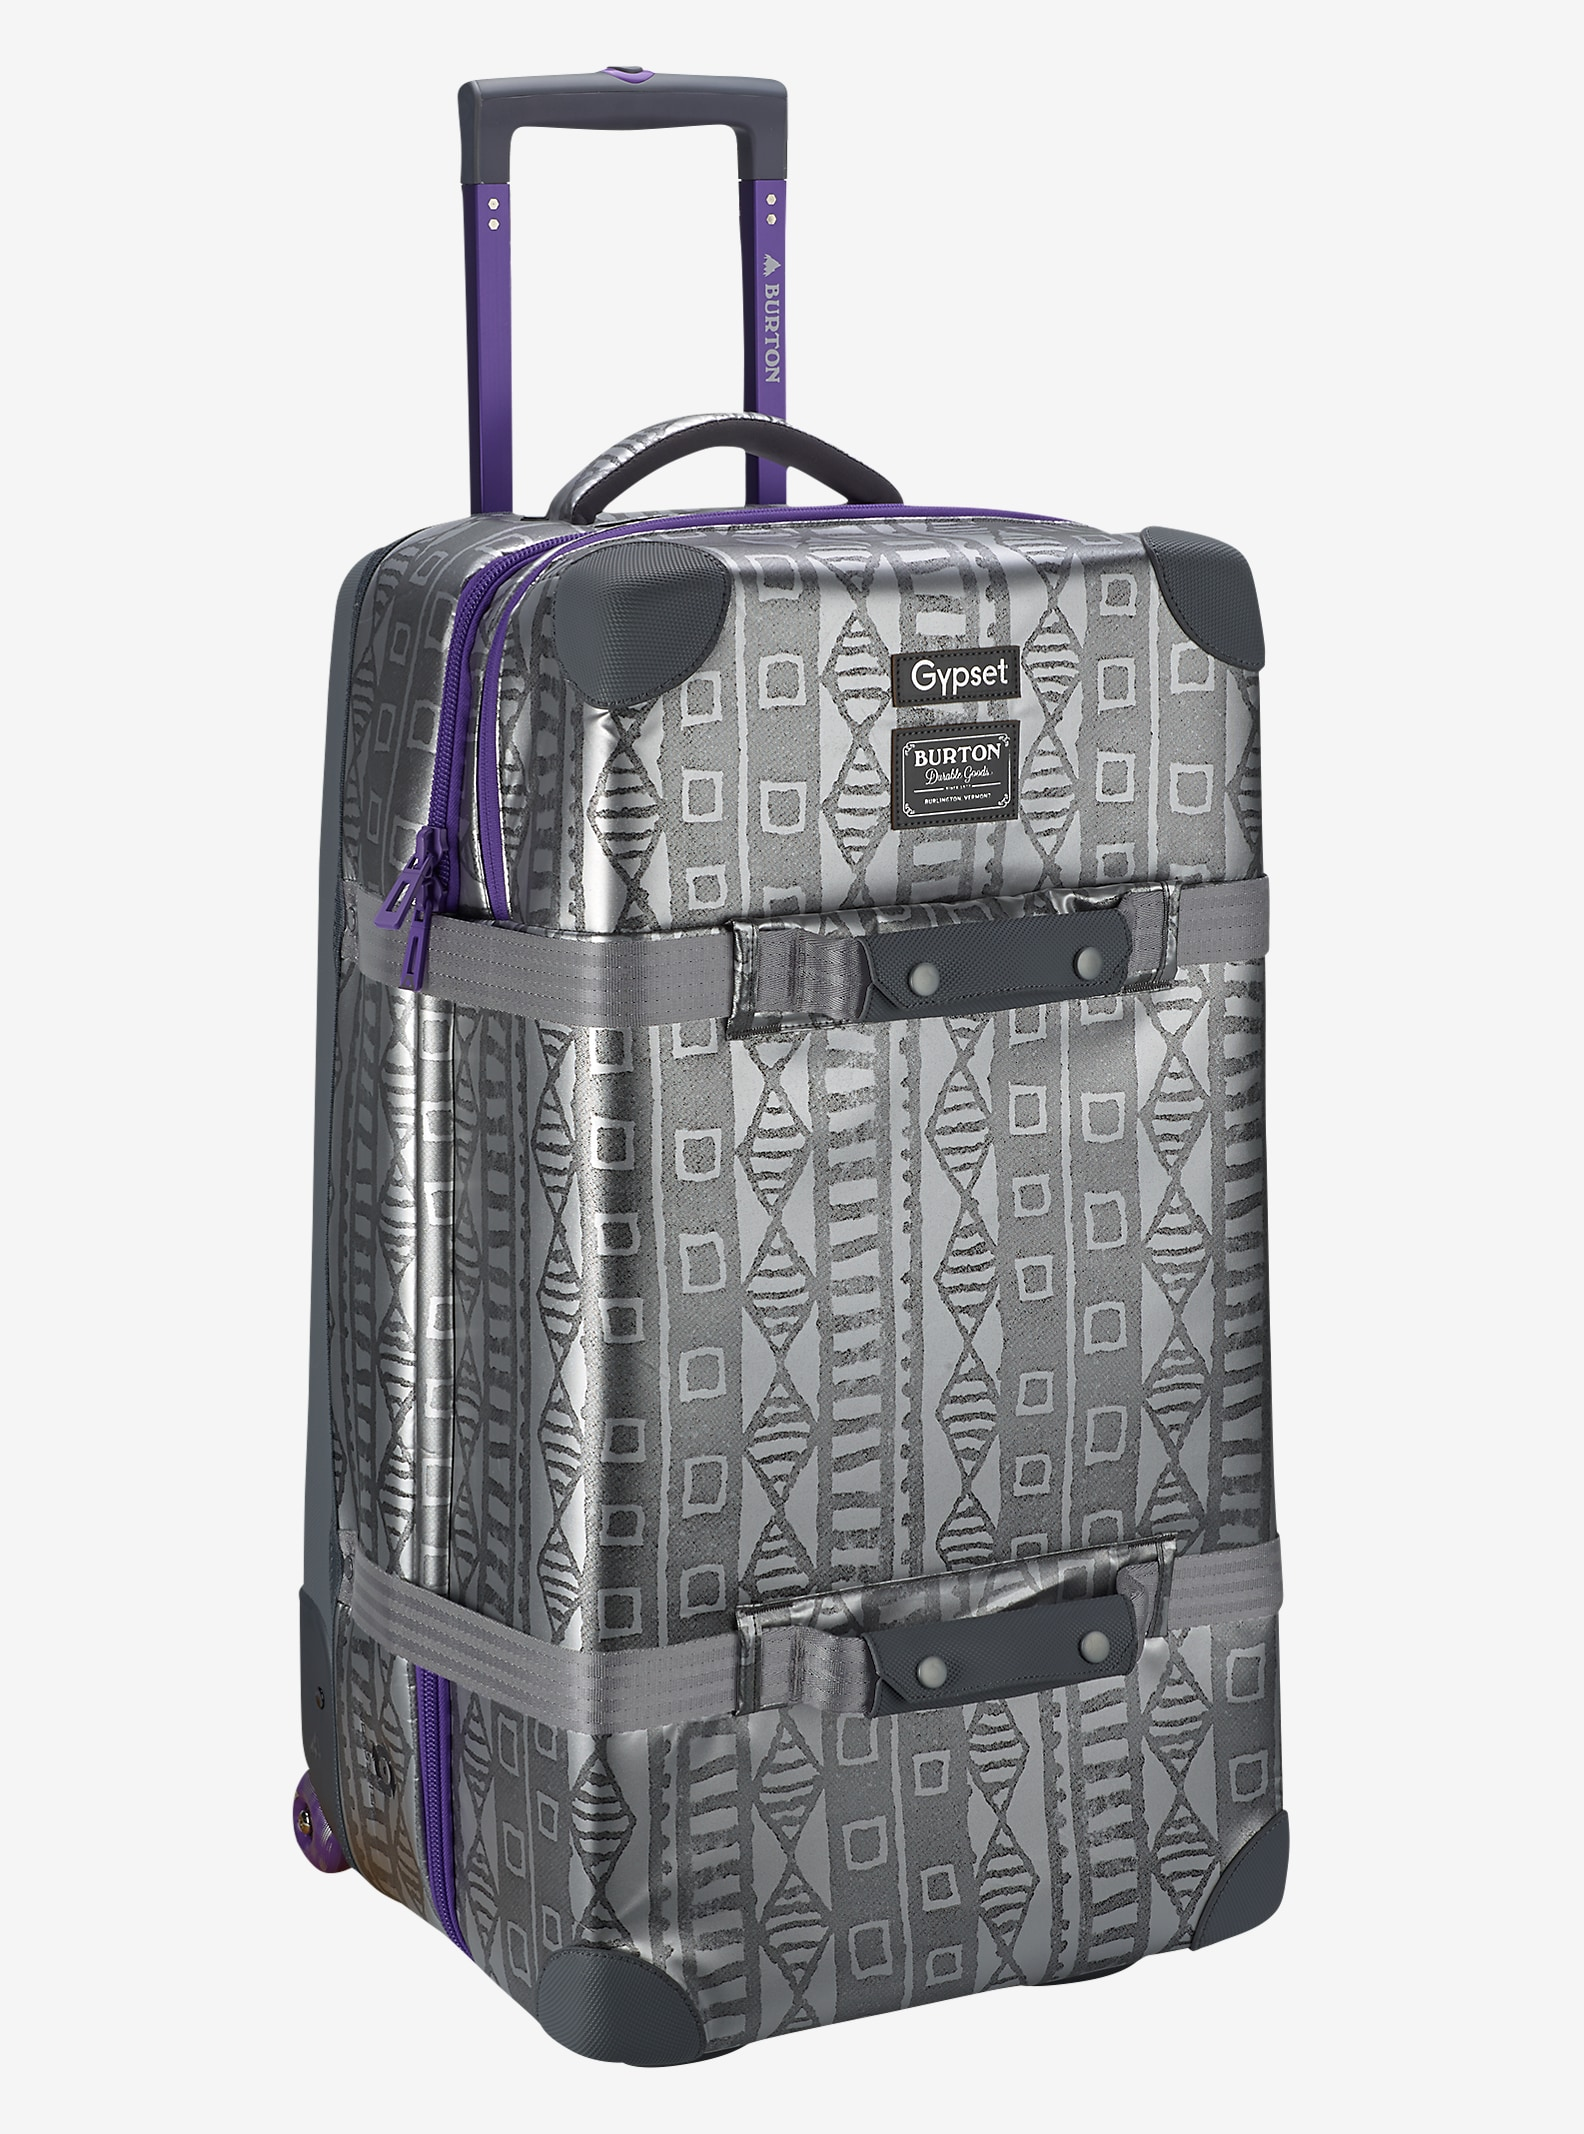 Burton x Gypset Wheelie Double Deck Travel Bag shown in Galactic Mudcloth